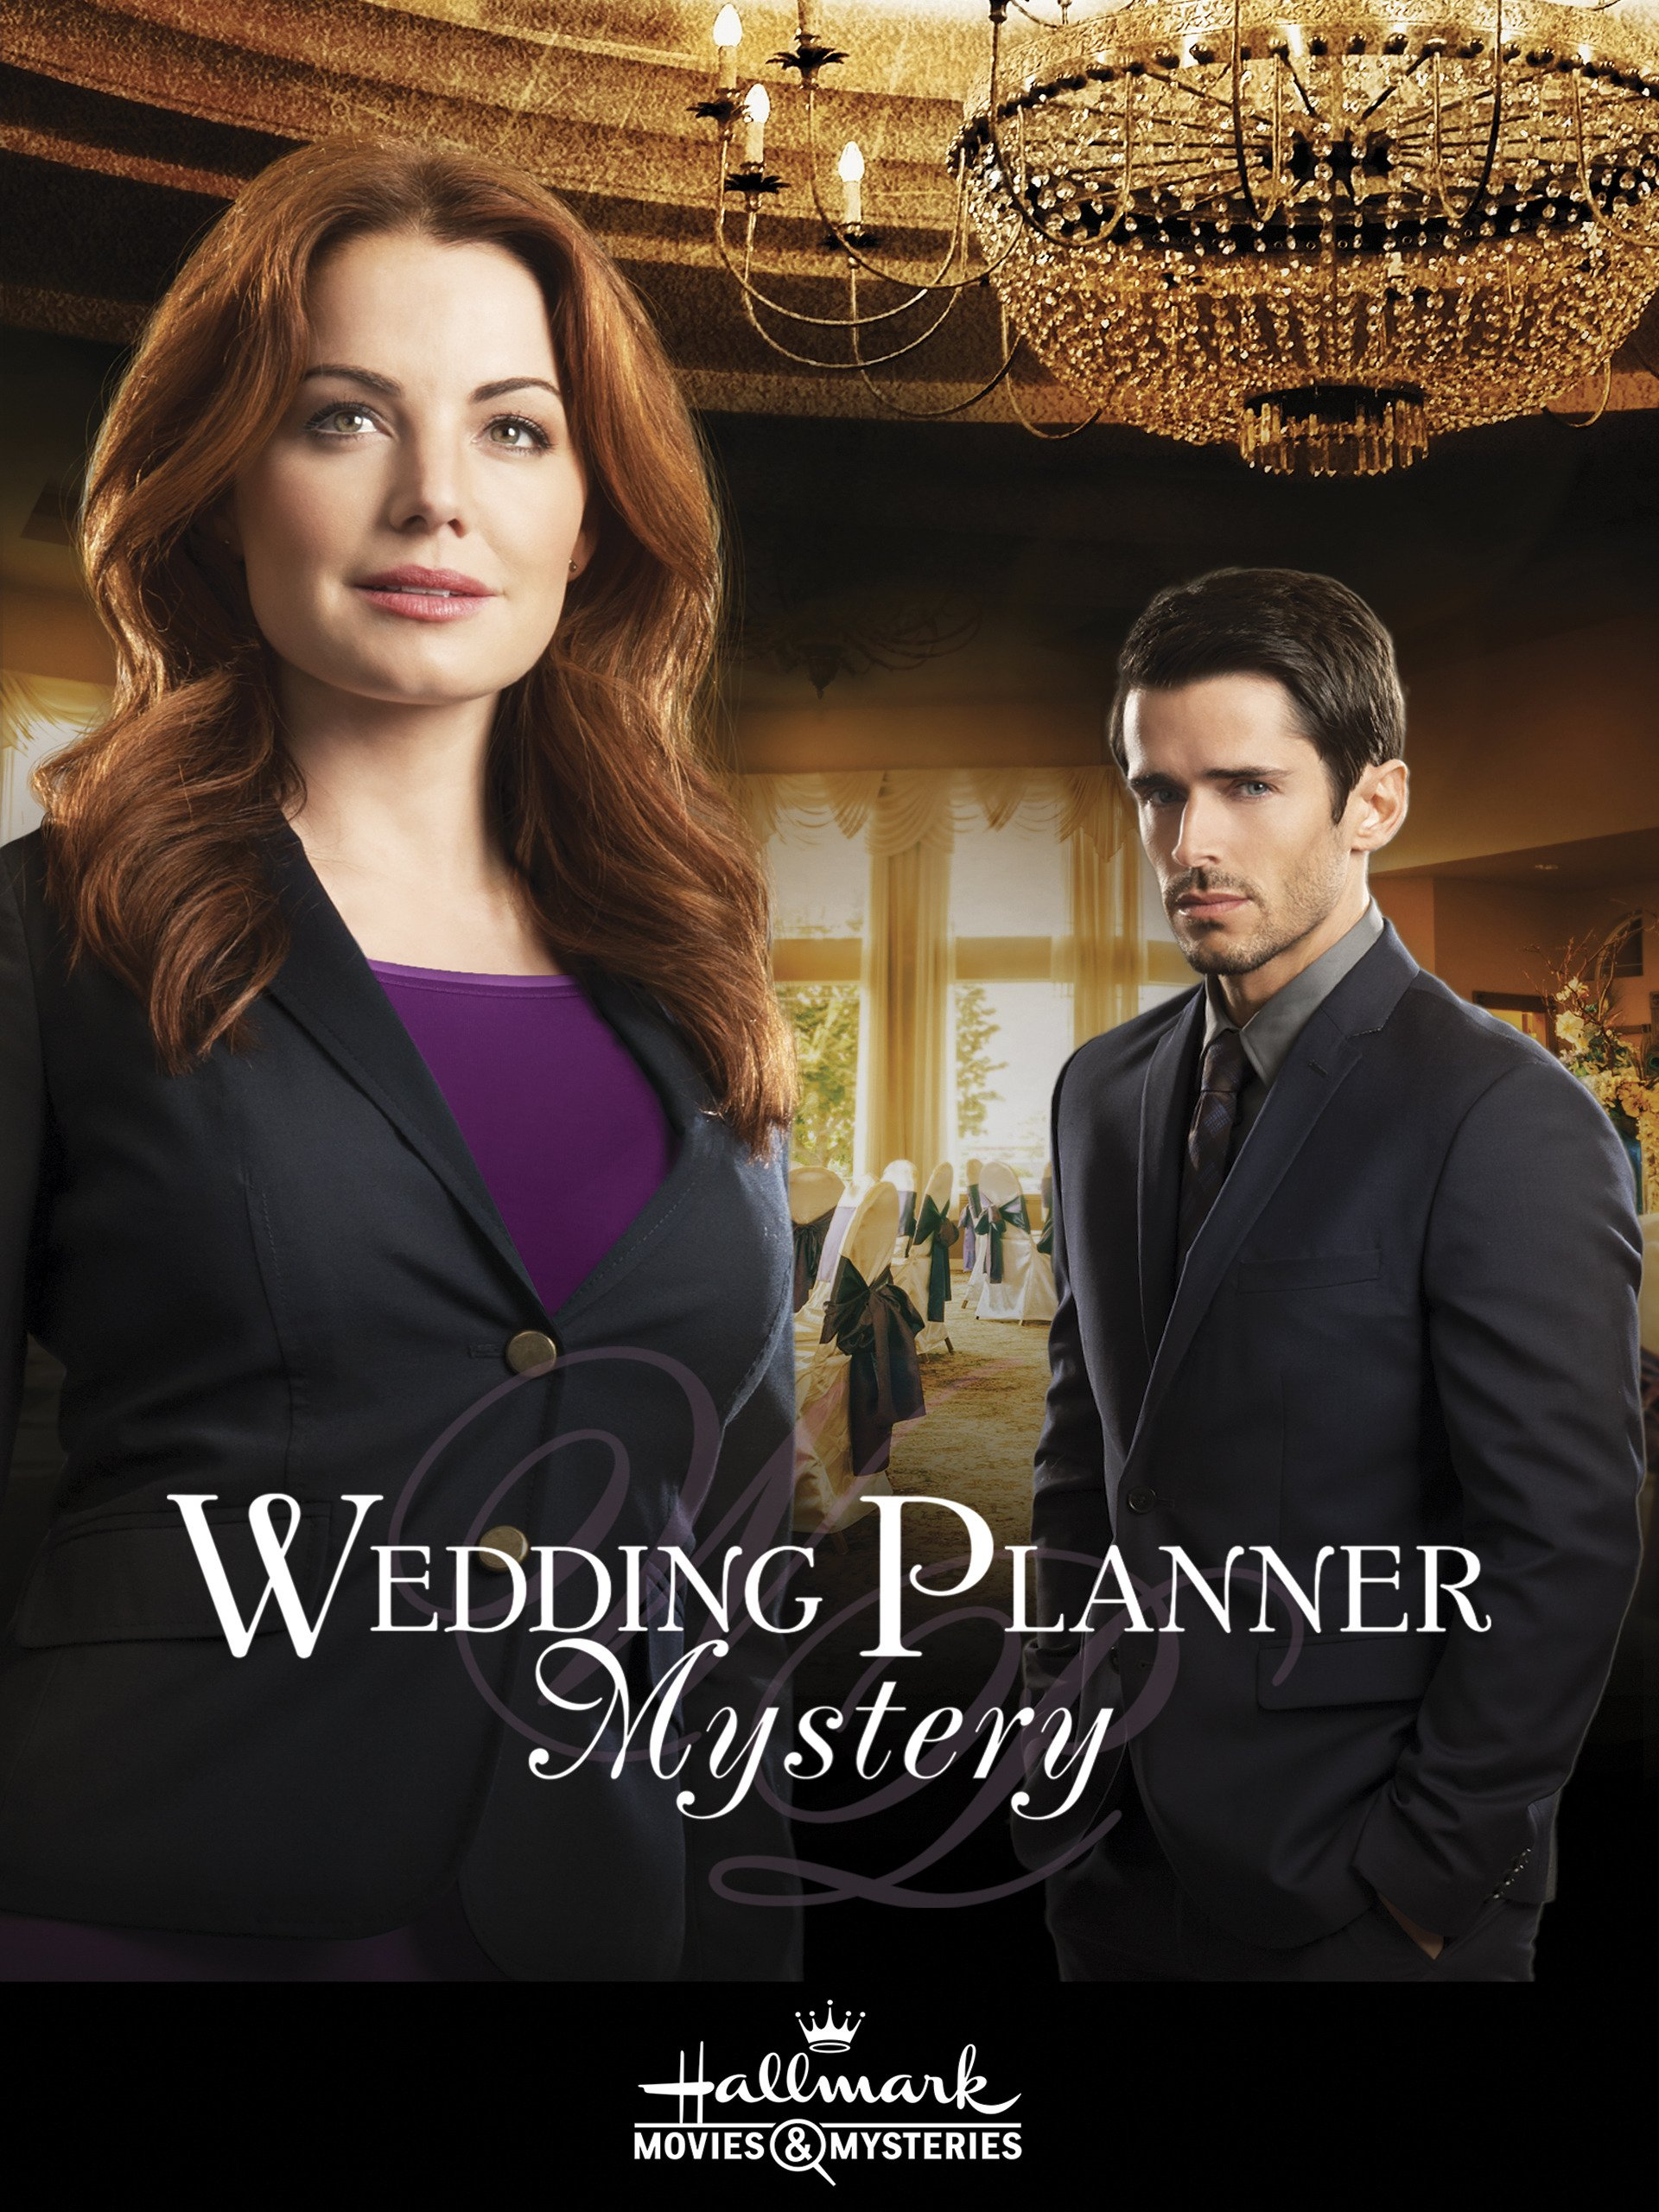 Hallmark Movies And Mysteries.Amazon Com Wedding Planner Mystery Erica Durance Andrew W Walker